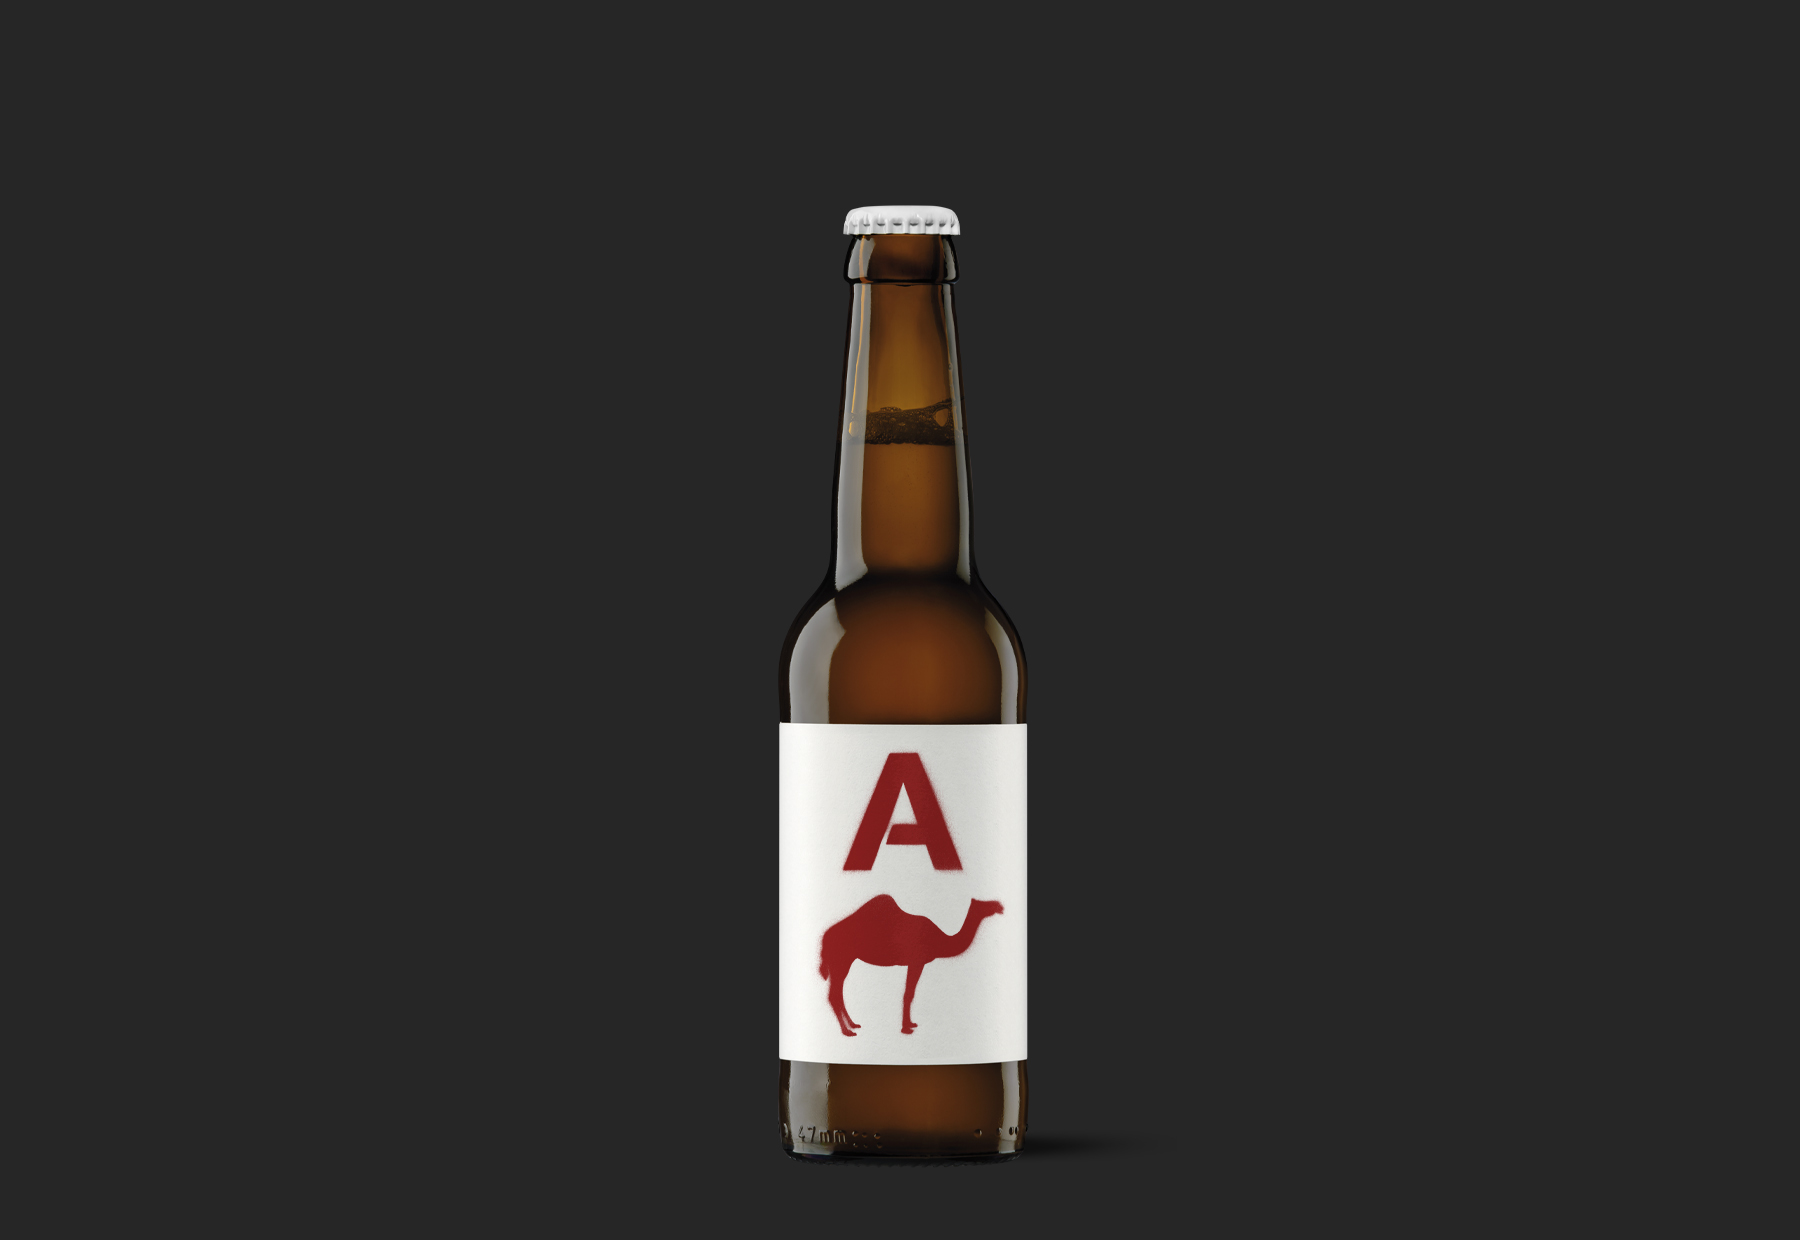 Parking Beer the Garage Spirit in a Bottle Designed by Moruba